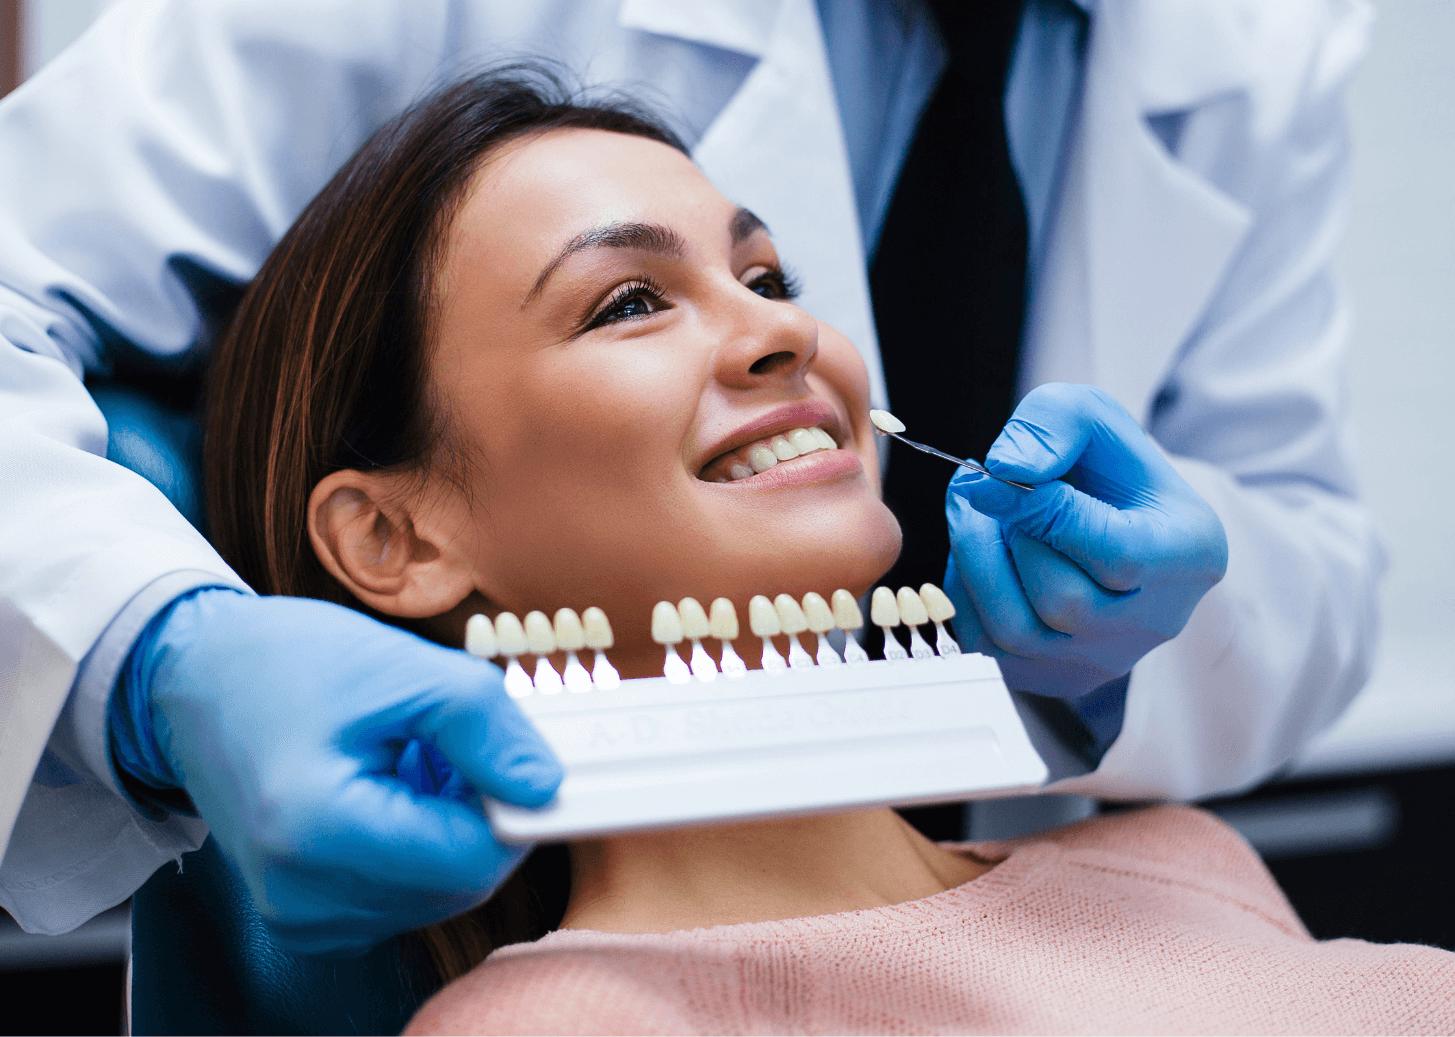 The Dental Implant Procedure Explained